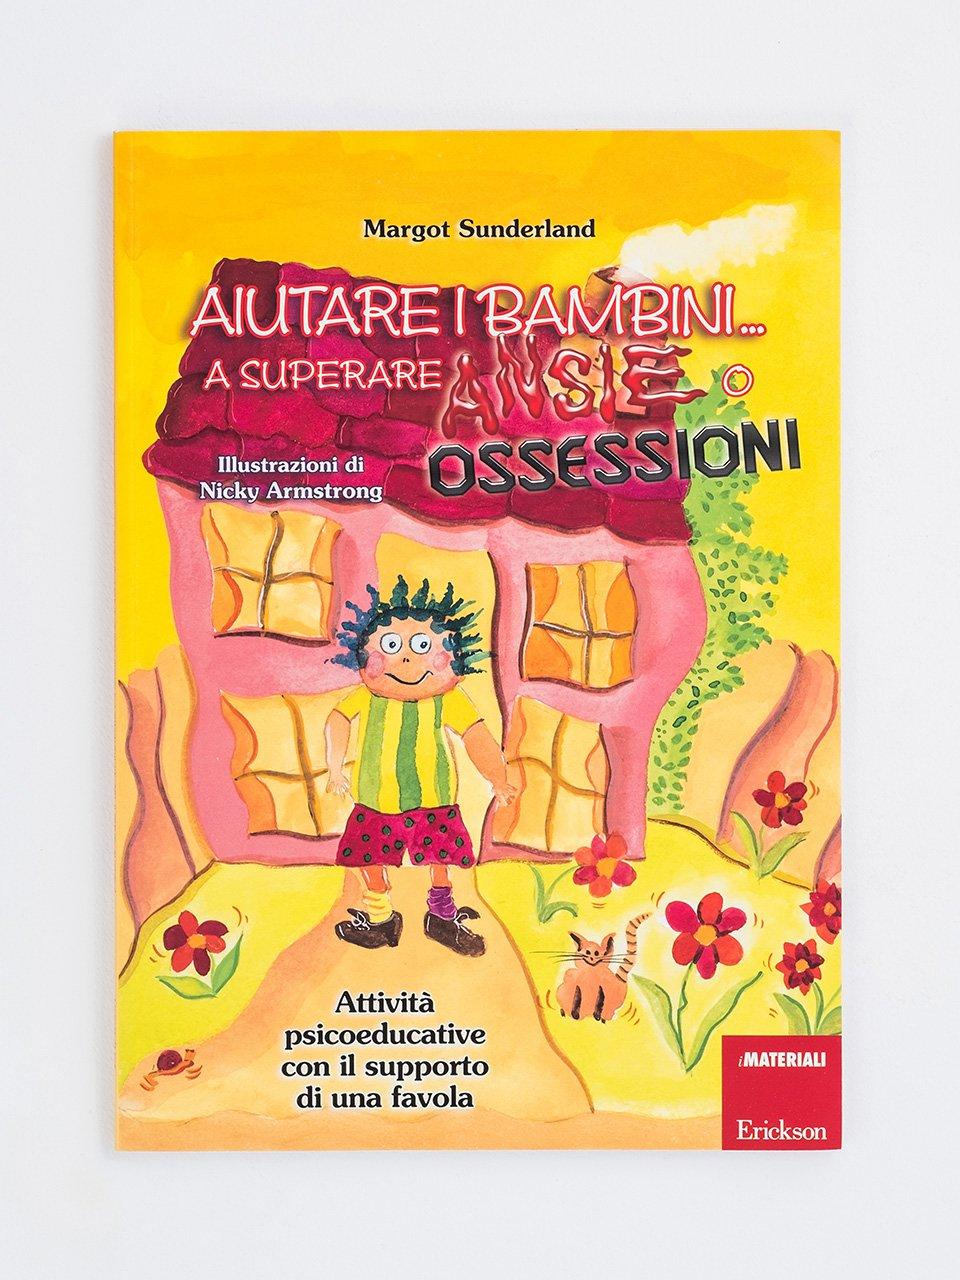 Aiutare i bambini... a superare ansie o ossessioni Libro + Allegati - Erickson Eshop